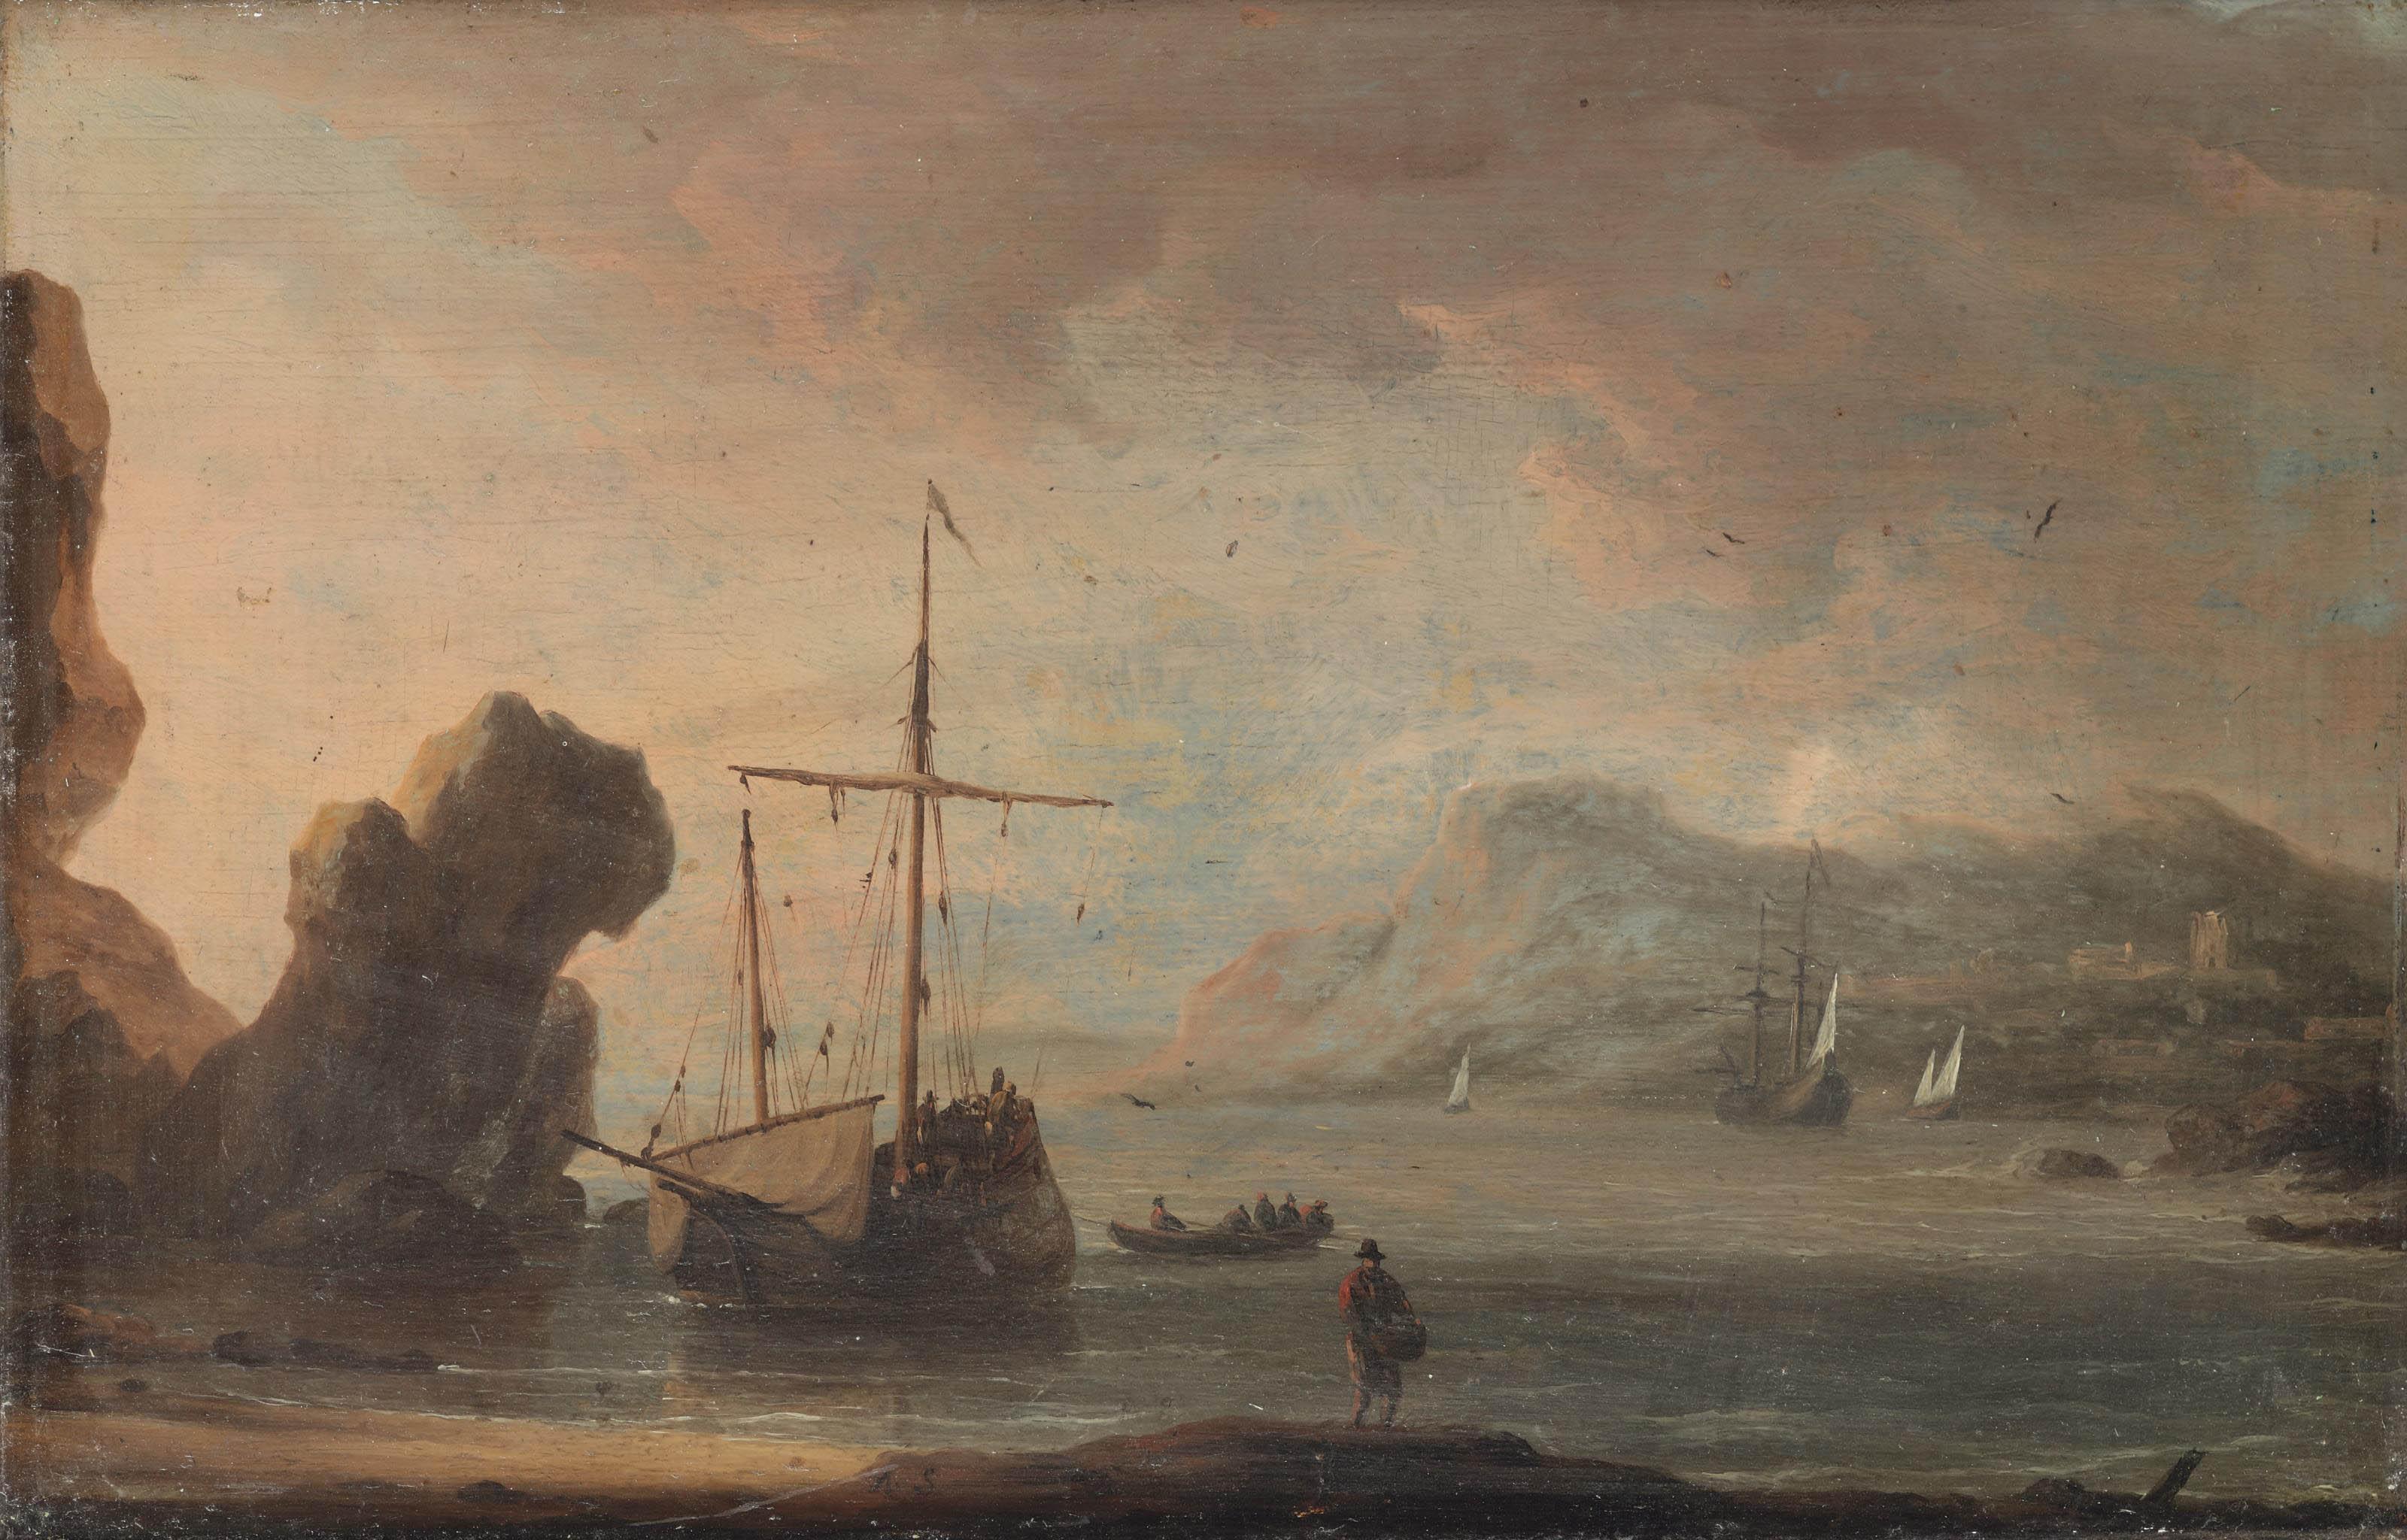 Ships in a quiet estuary